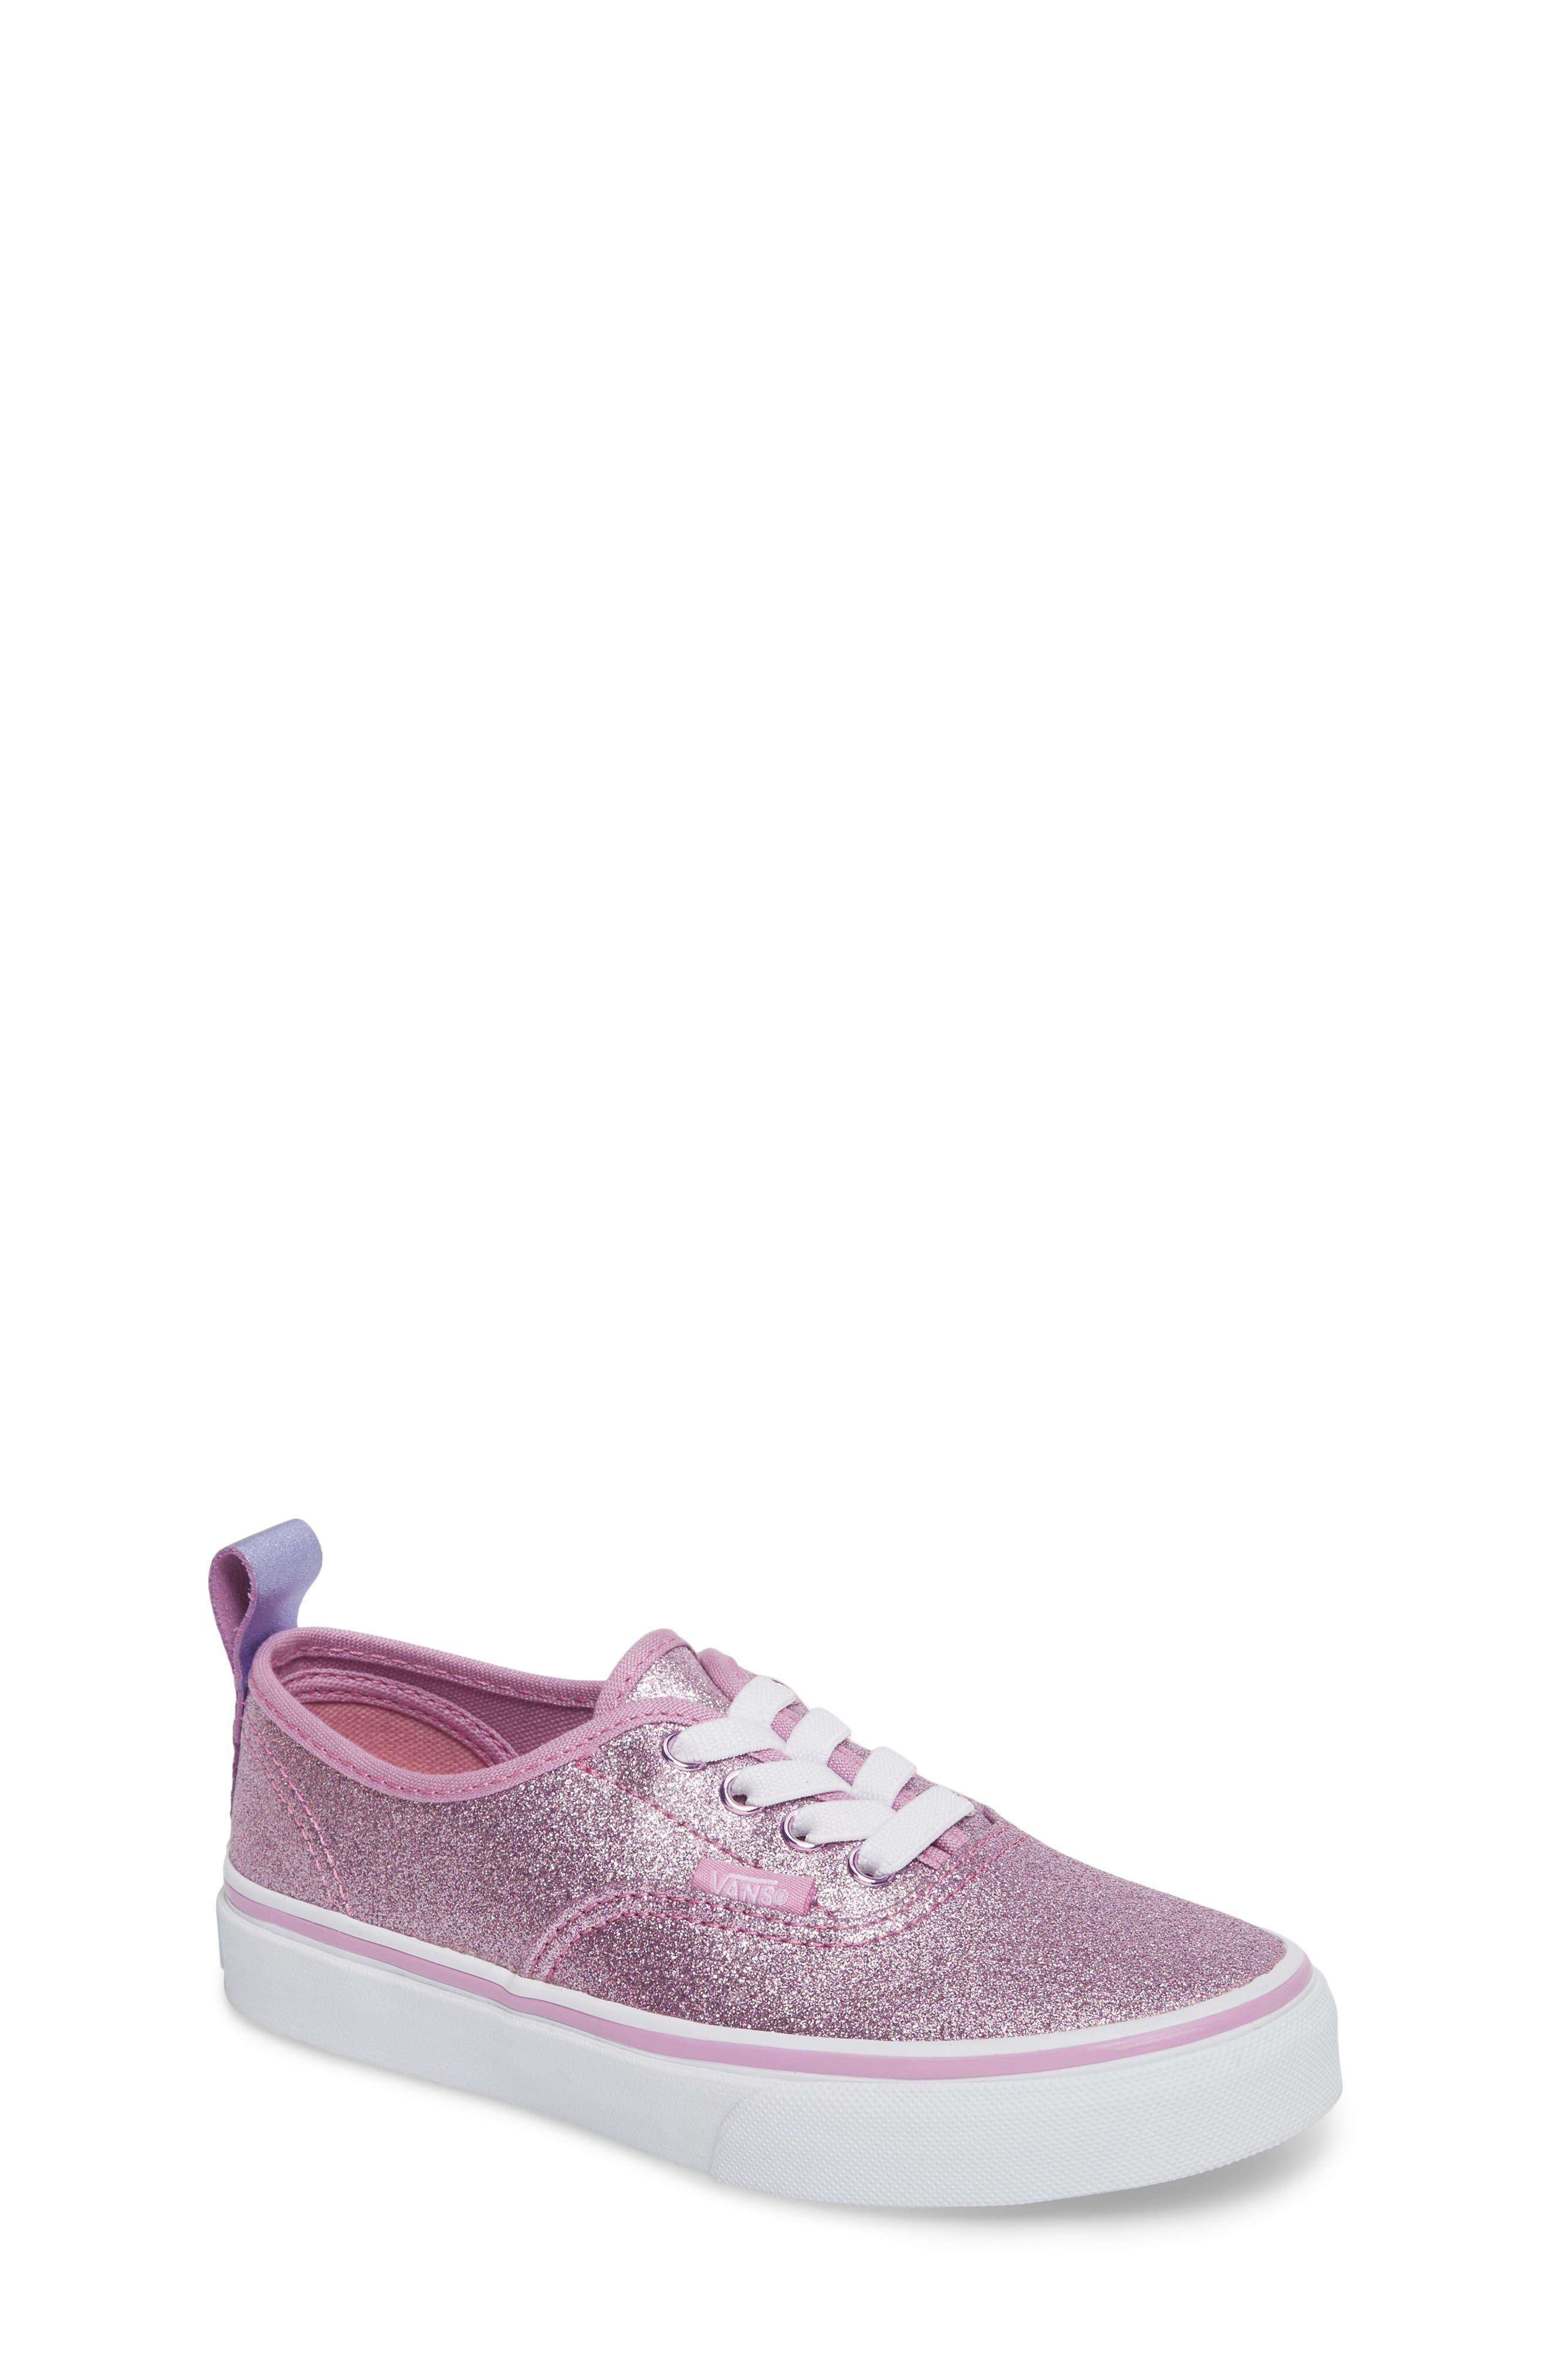 Main Image - Vans Glitter Authentic Elastic Lace Sneaker (Baby, Walker, Toddler, Little Kid & Big Kid)